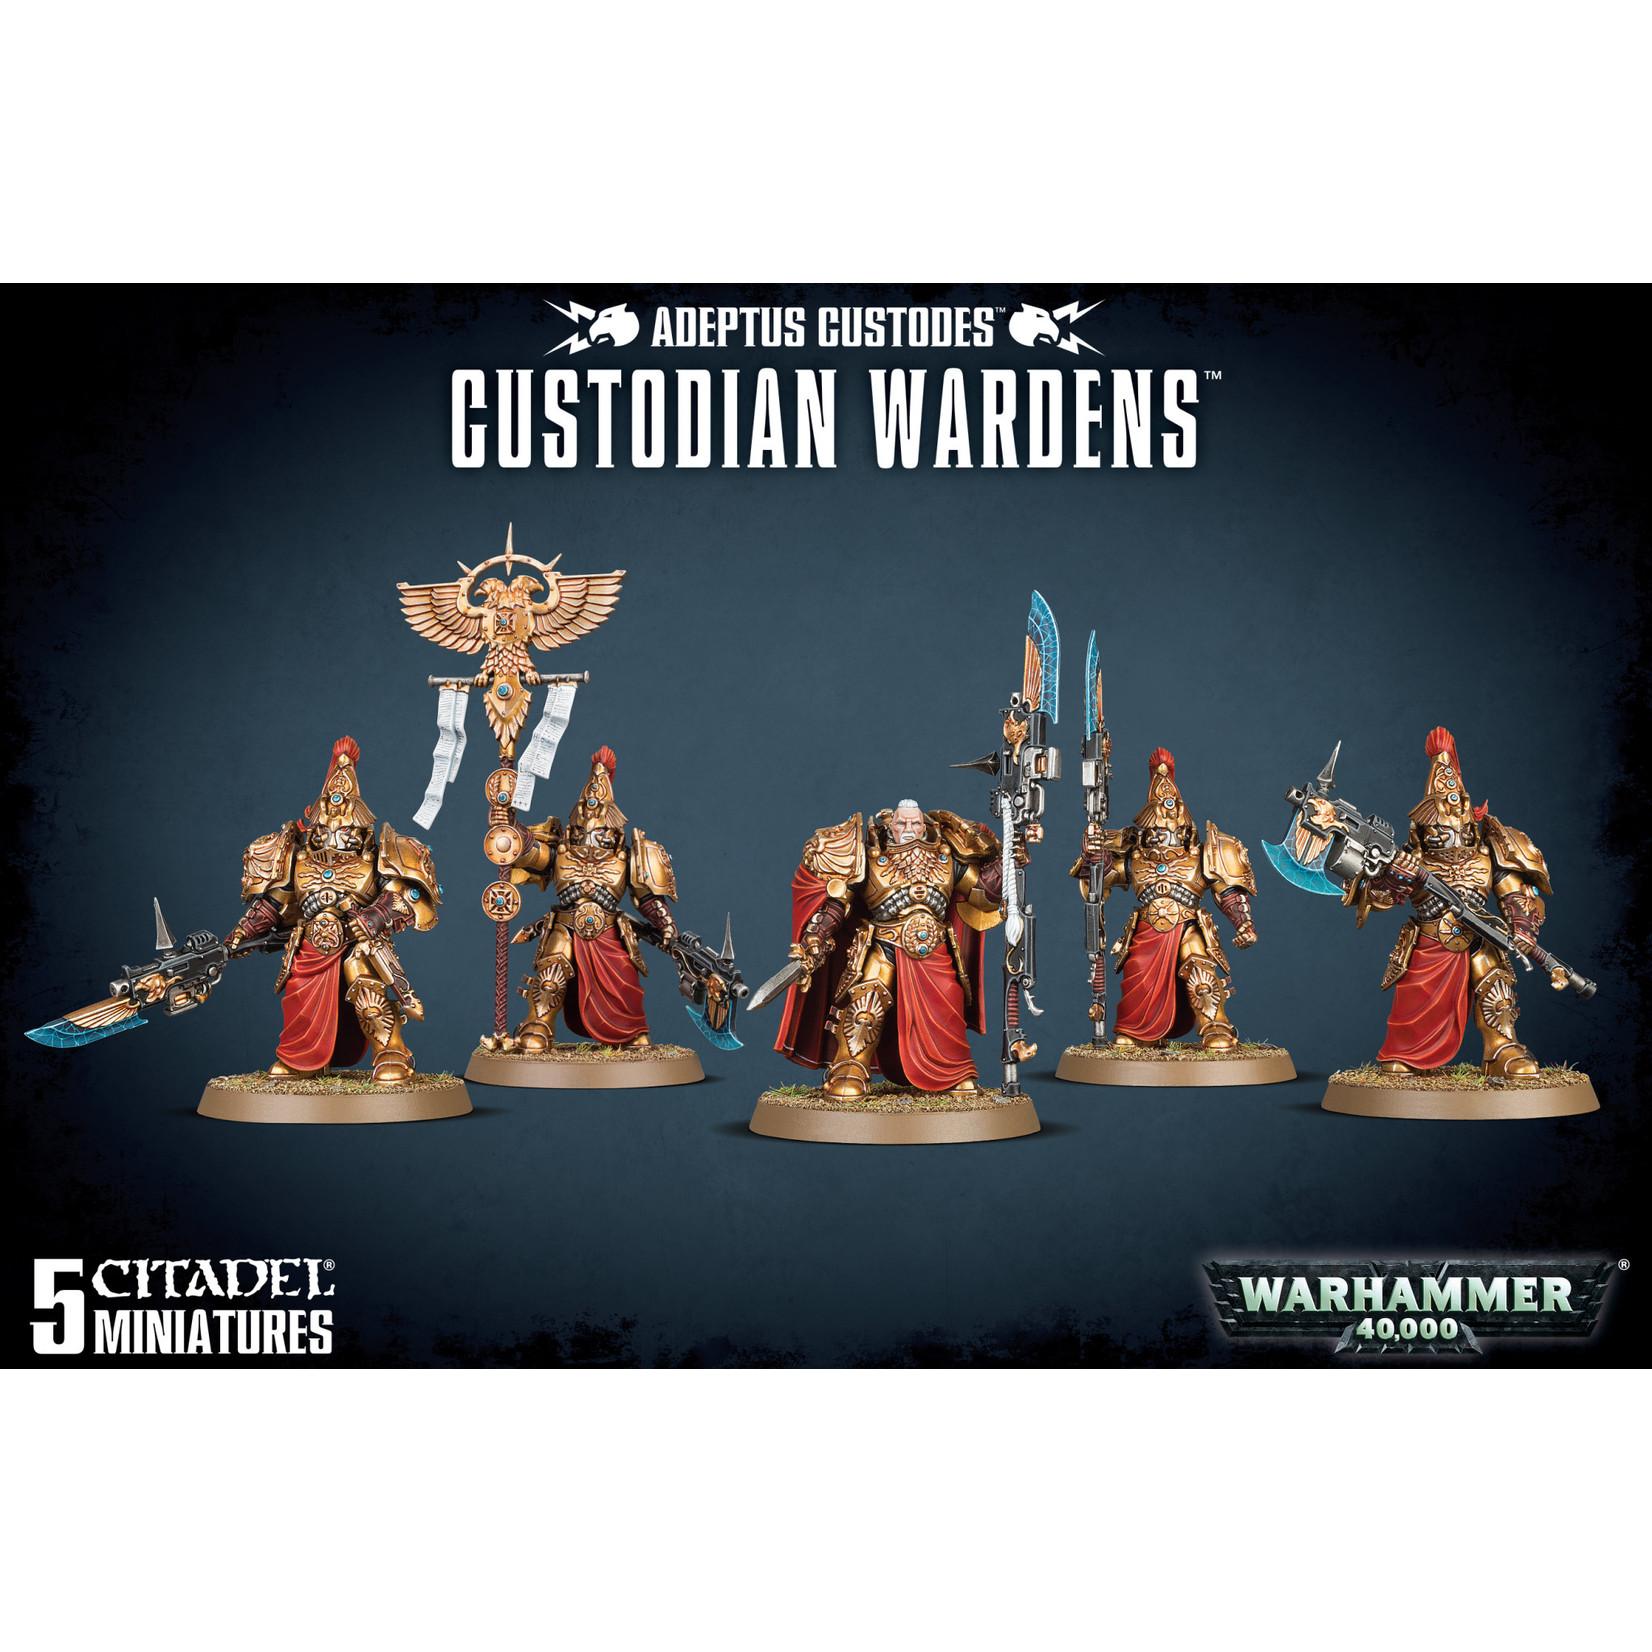 Games Workshop Warhammer 40k: Adeptus Custodes - Custodian Wardens